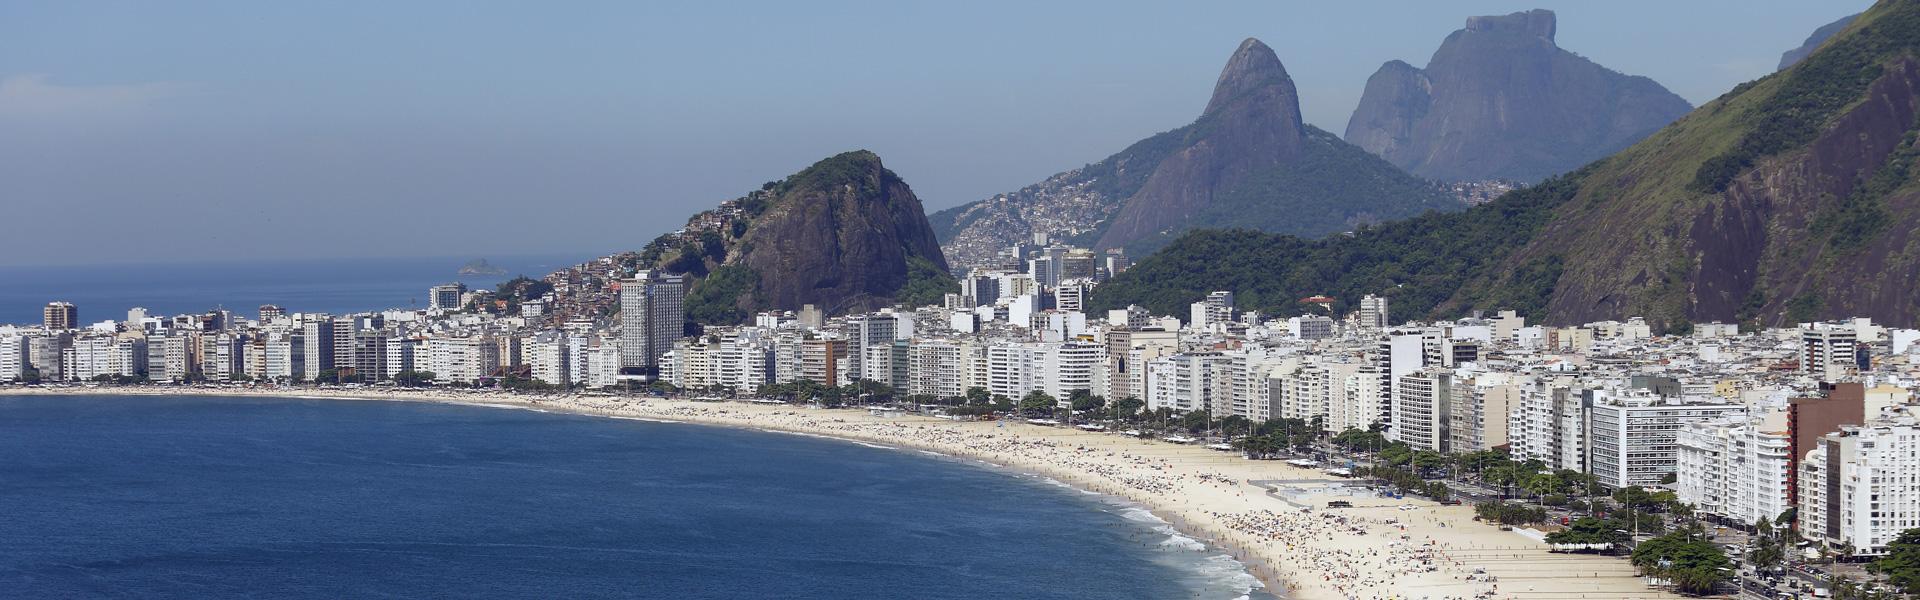 bigstock-Copacabana-beach-Rio-de-Janei-58946735_1920x600